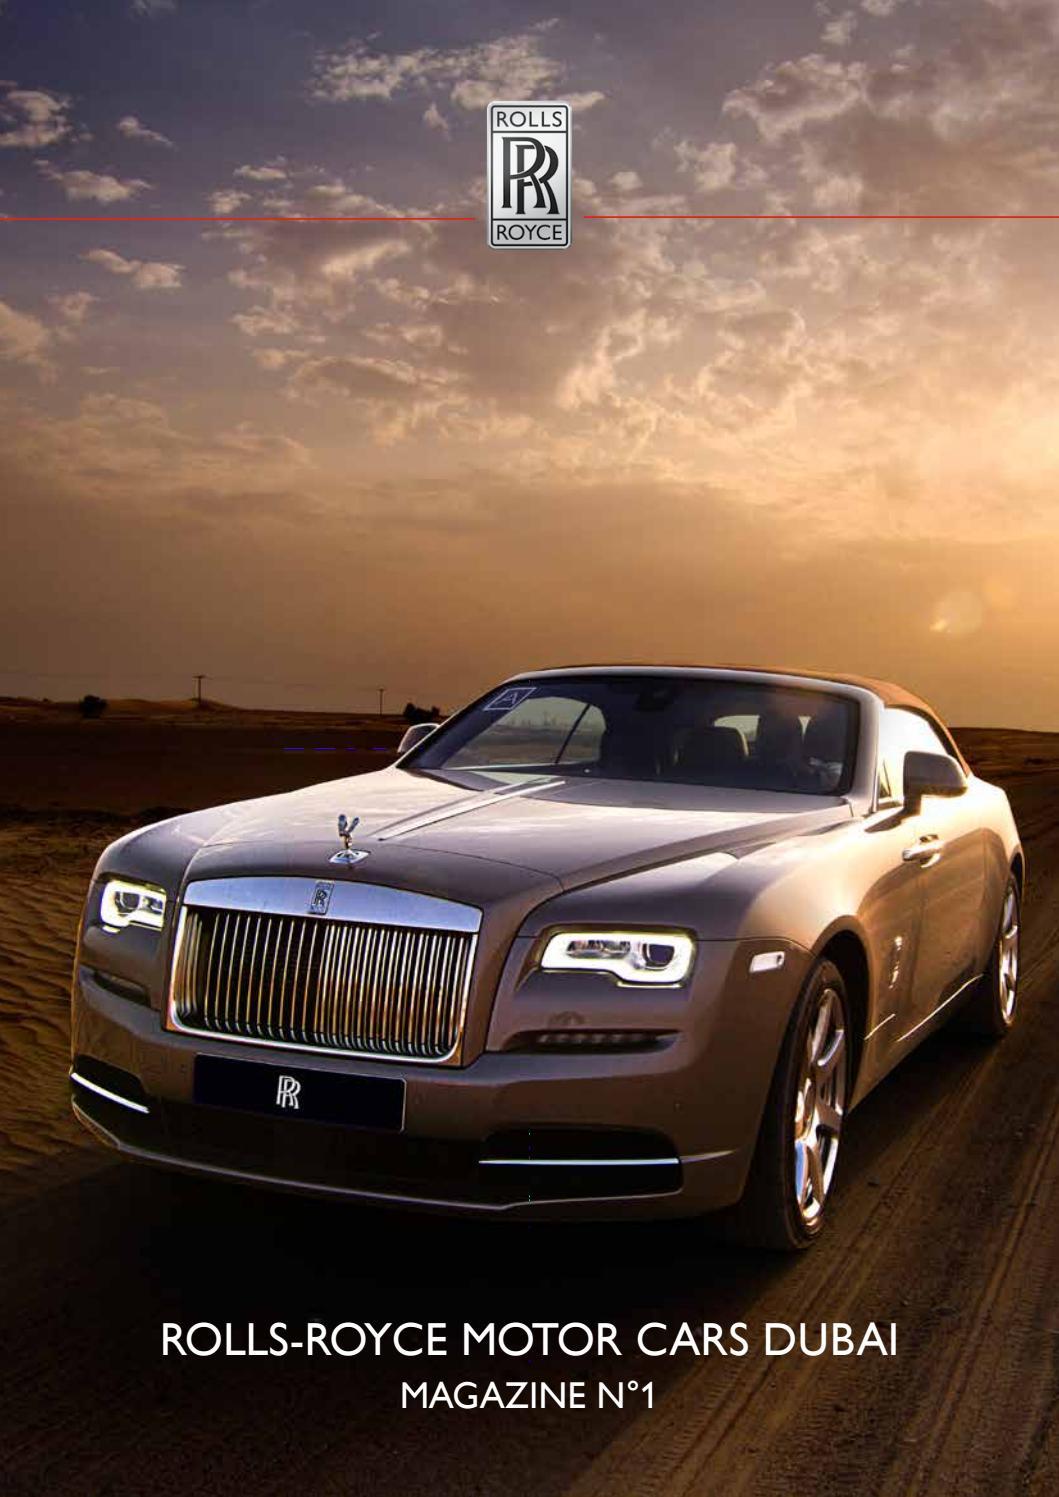 Rolls royce motor cars dubai customer magazine by steve for Rolls royce motor cars